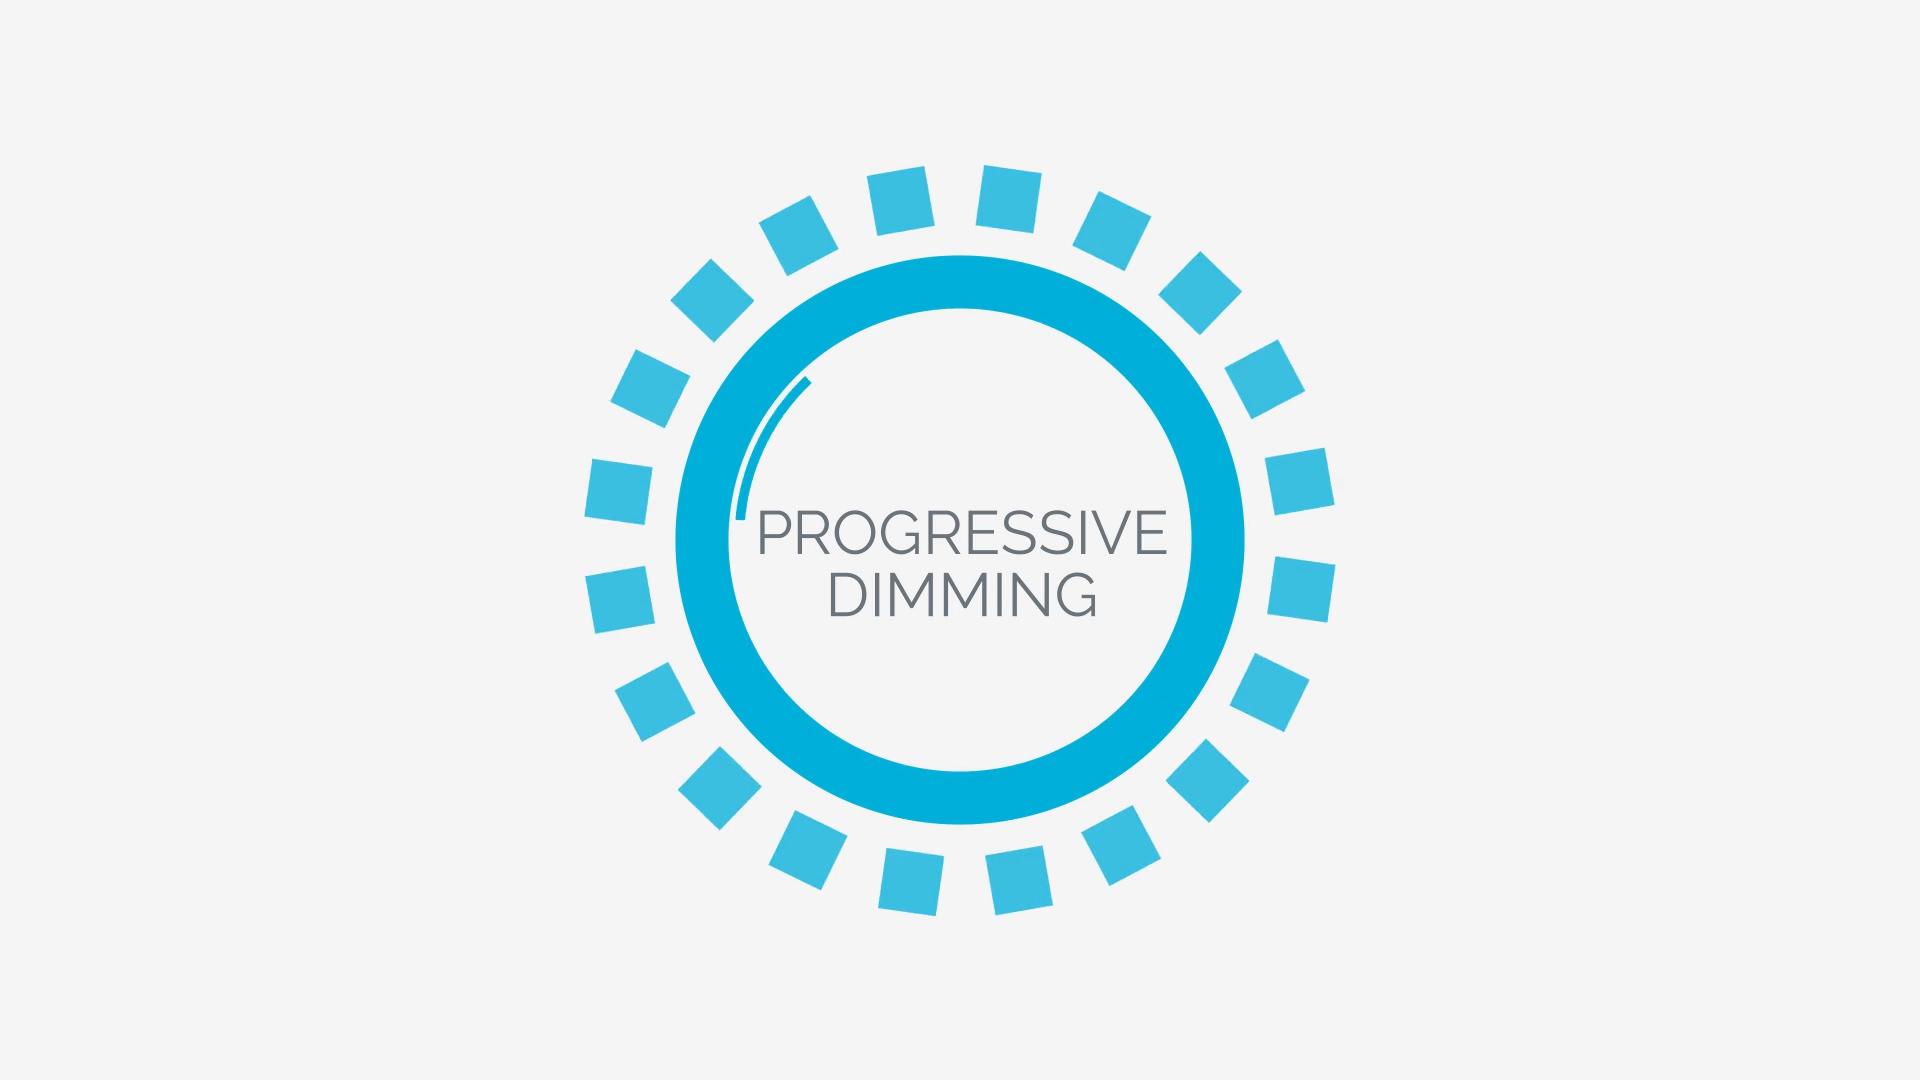 Progressive_dimming